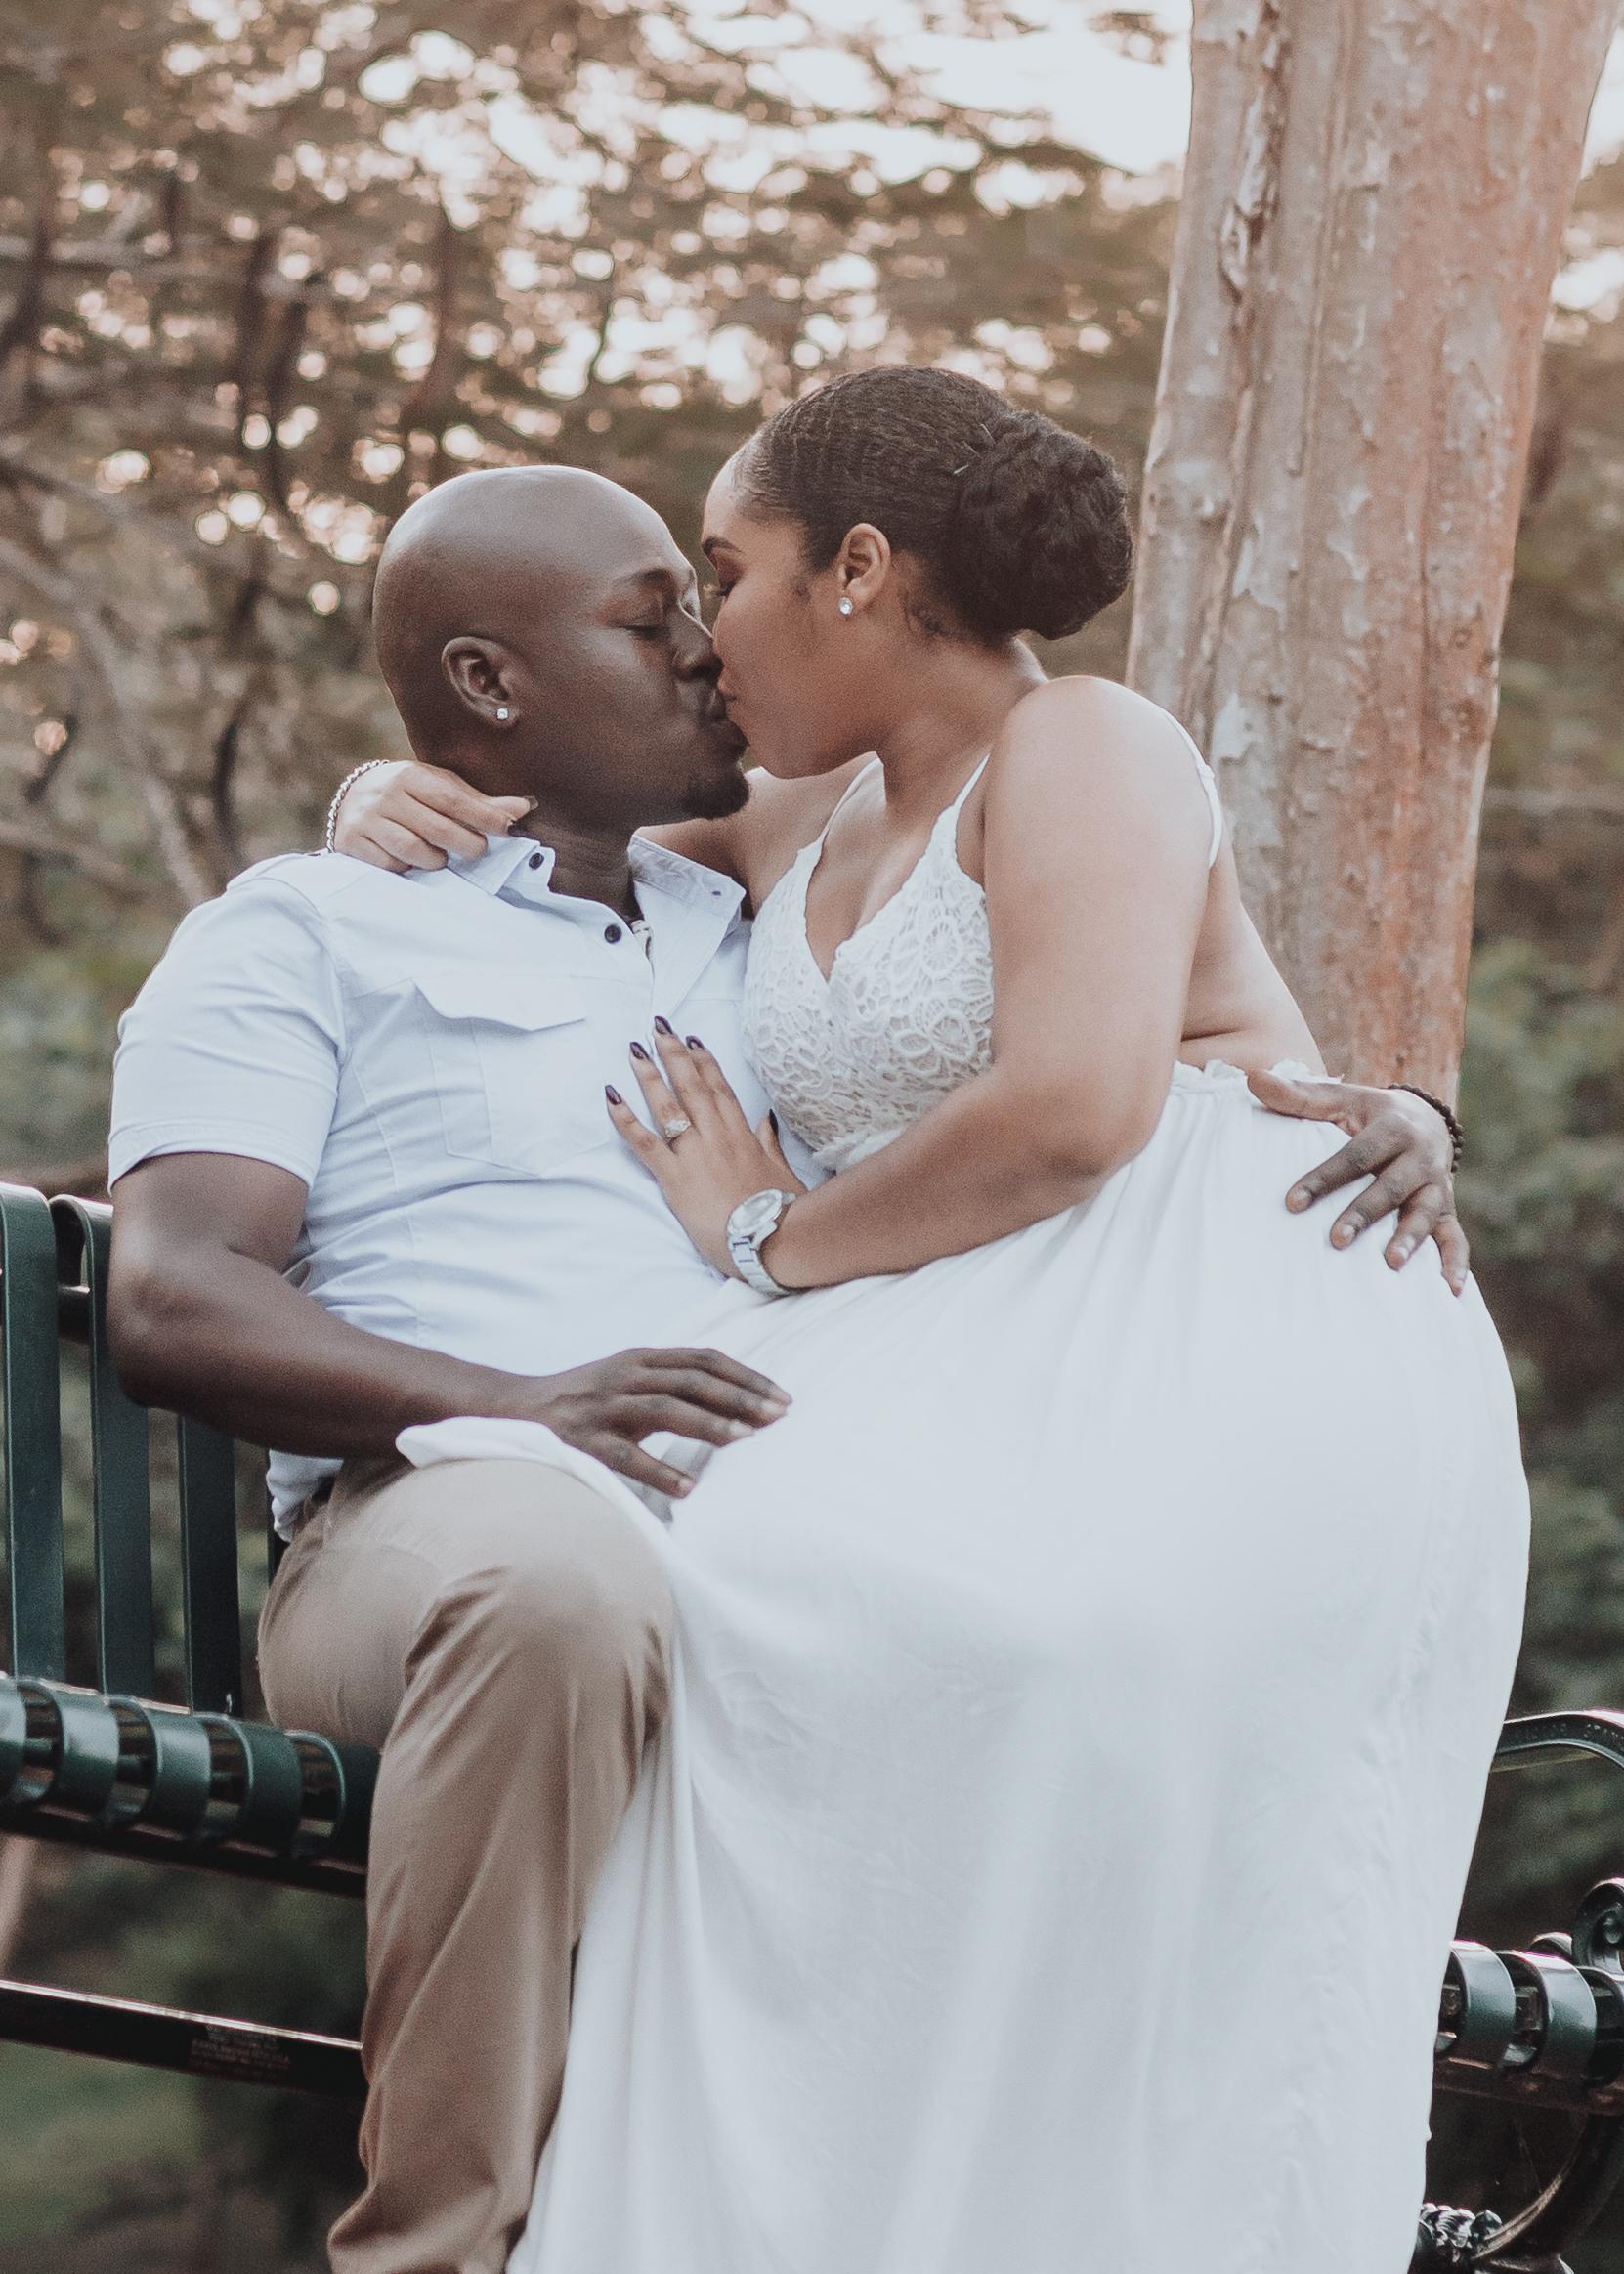 Teheila & Dominic Engagement-62.jpg